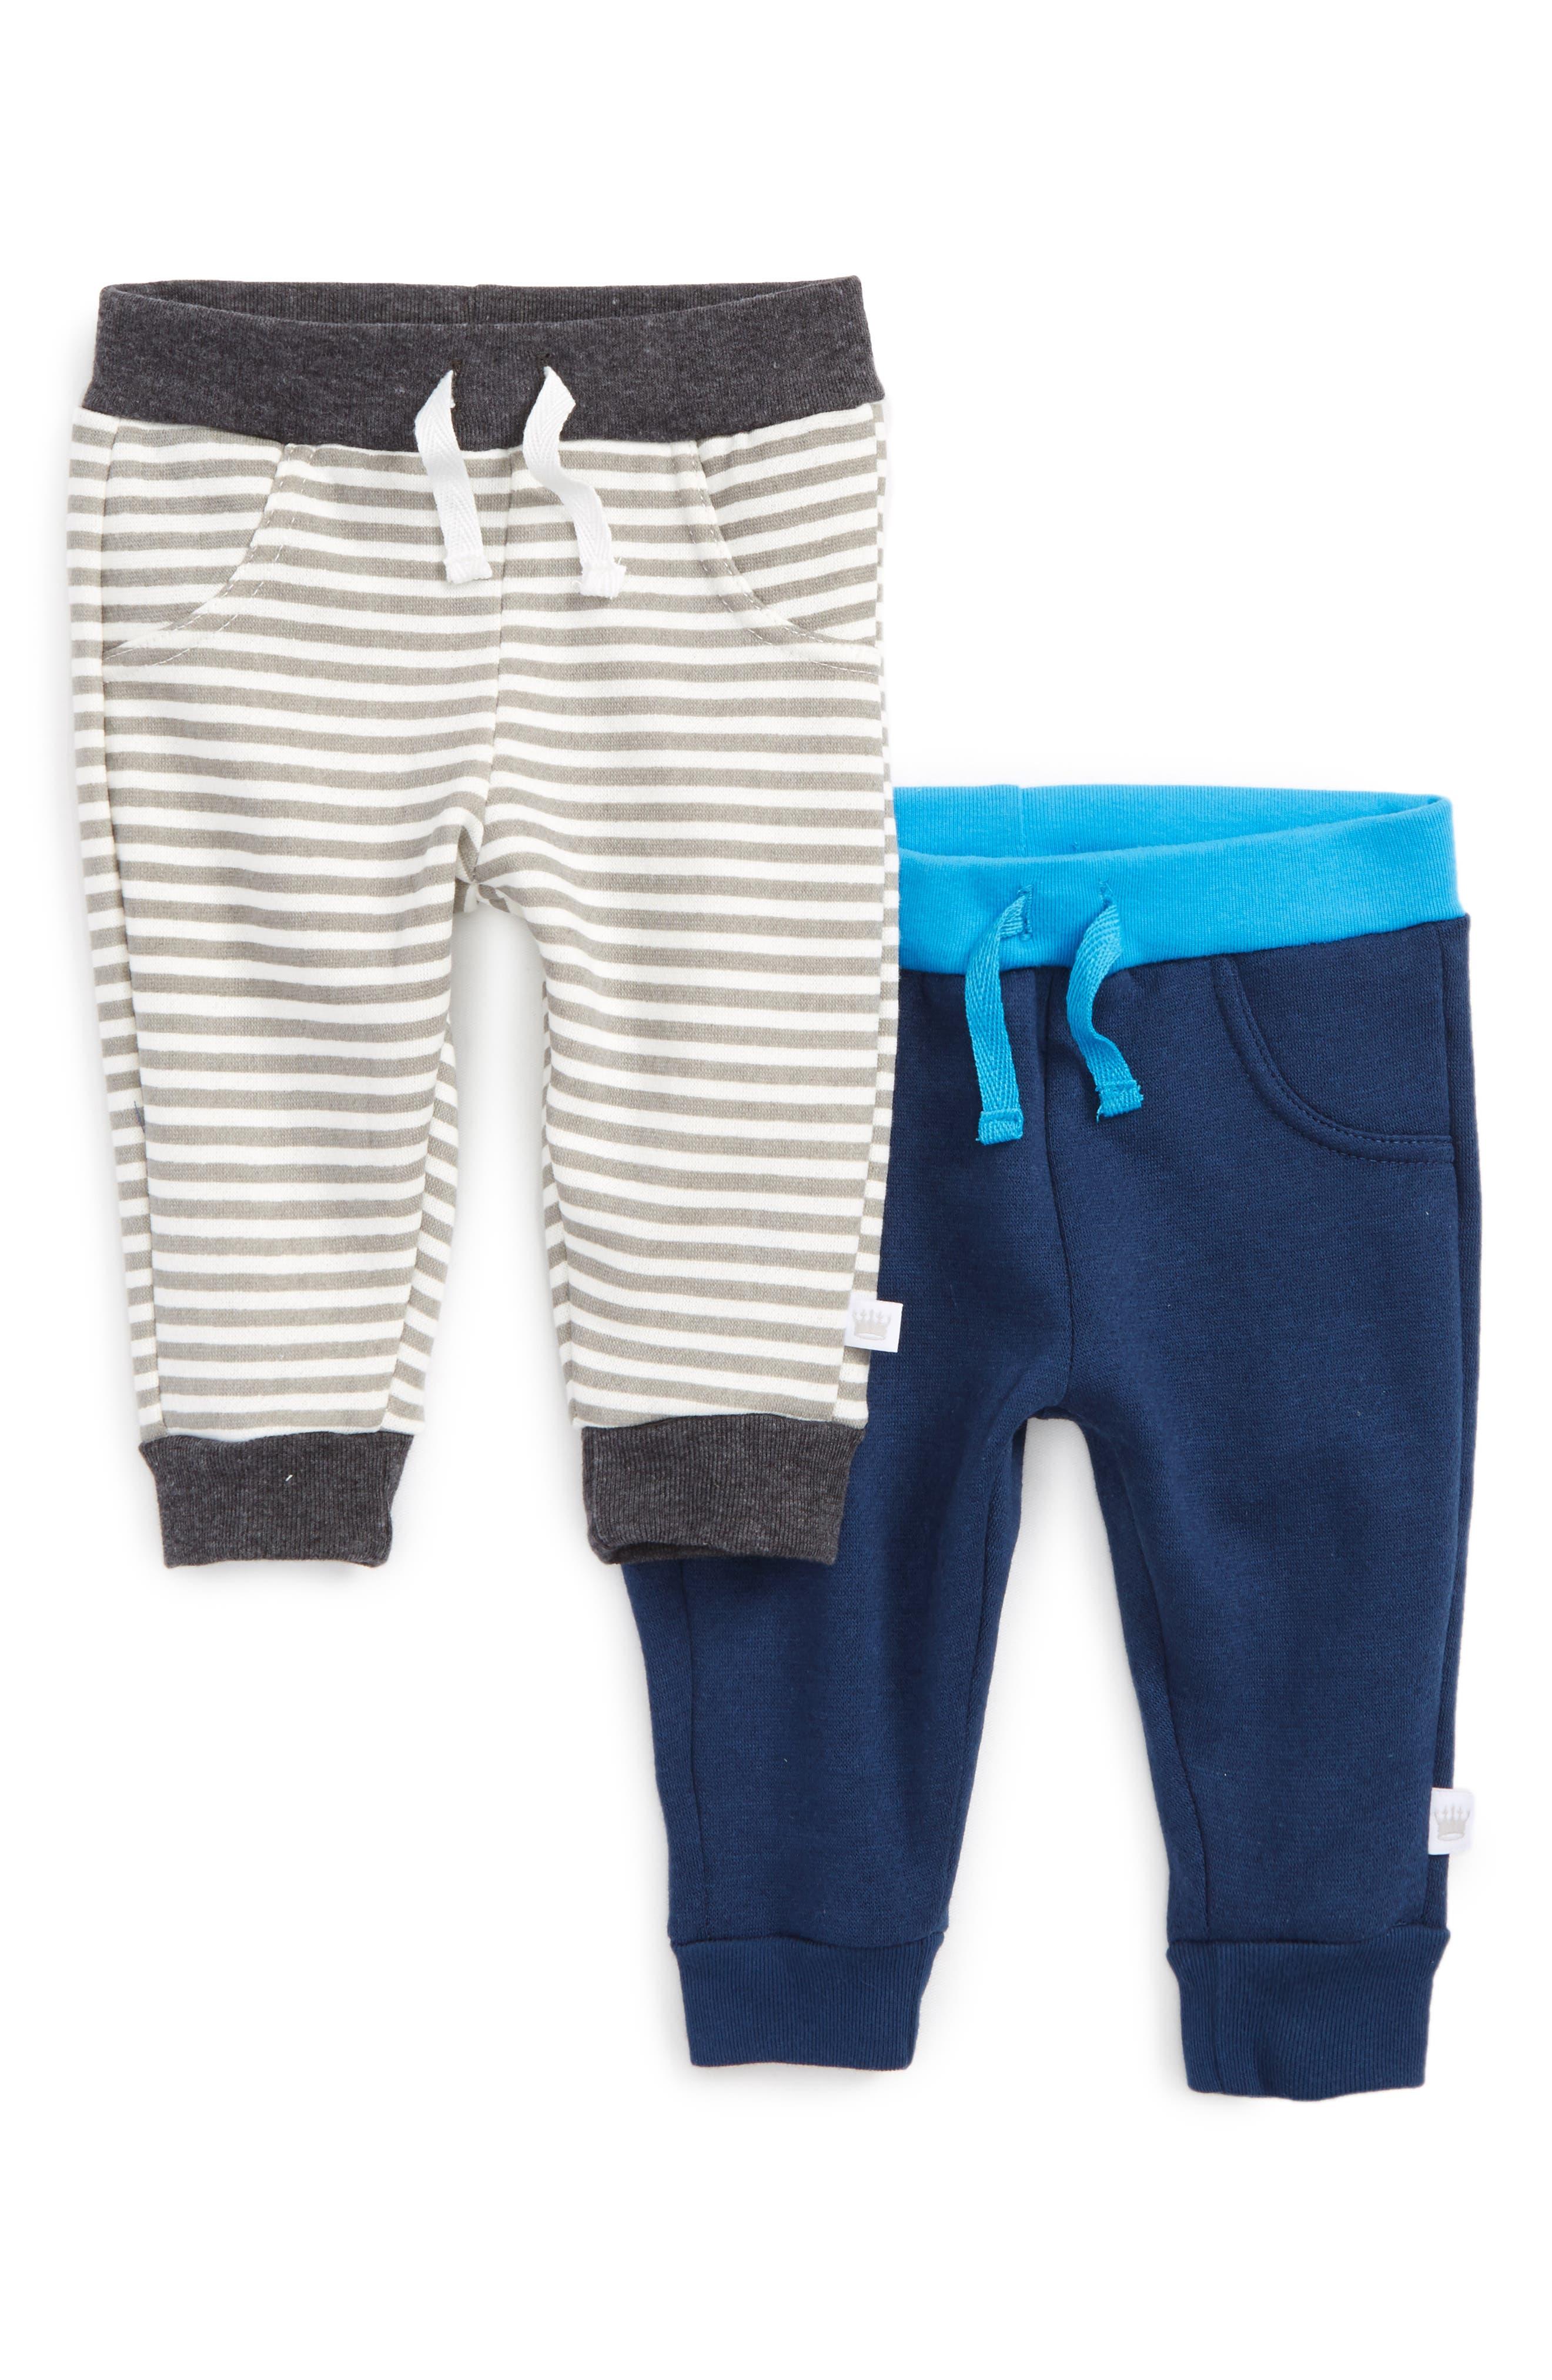 2-Pack Sweatpants,                         Main,                         color,